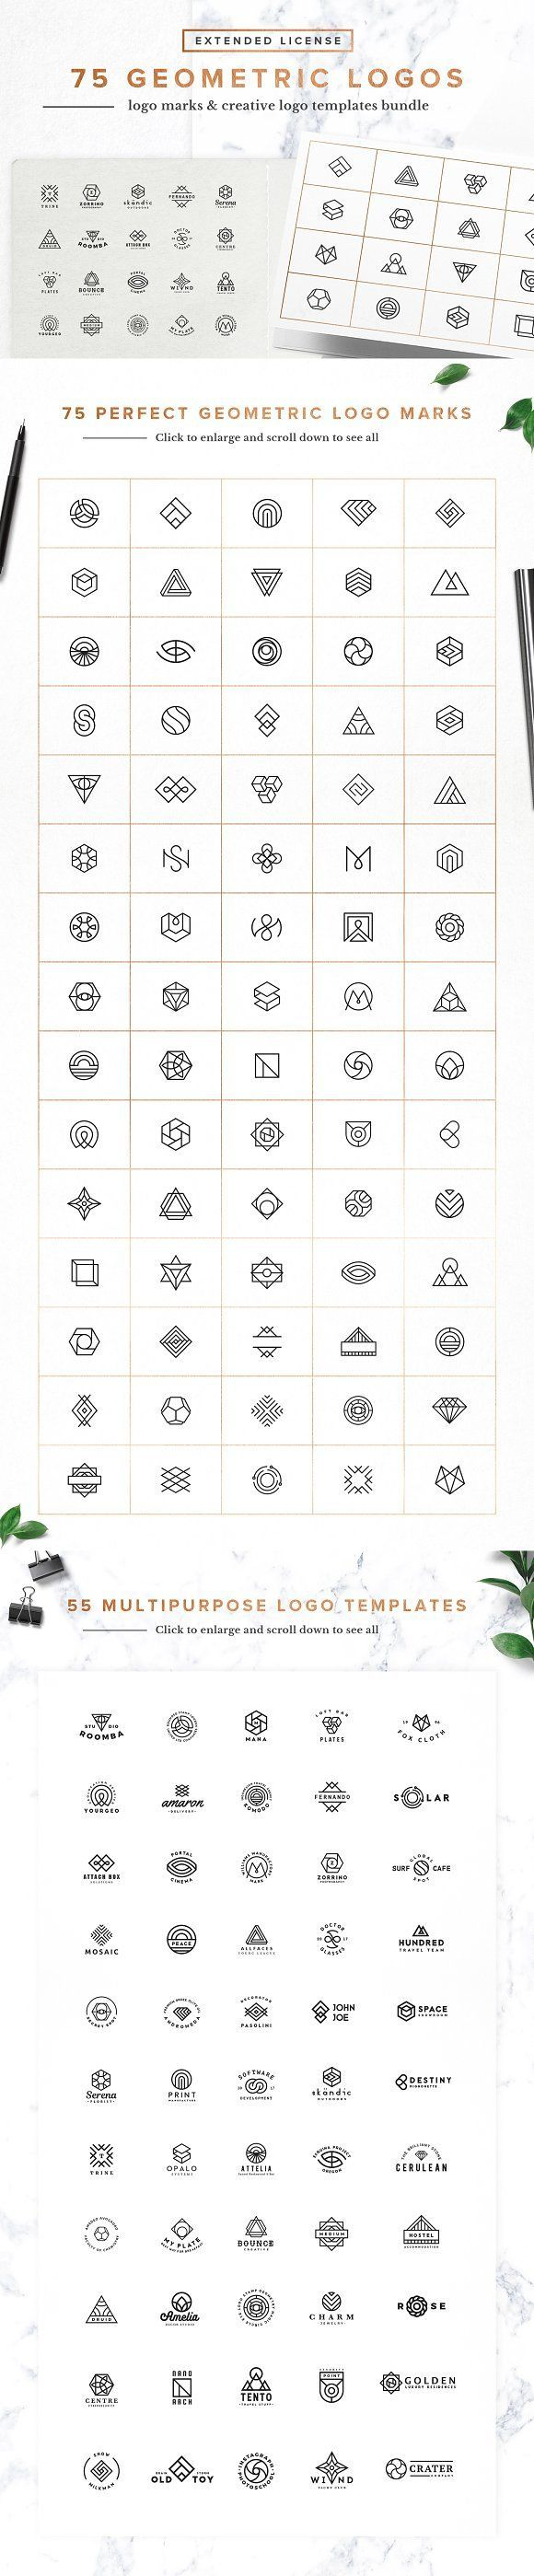 75 Geometric Logo Bundle by Spensers Family on @creativemarket